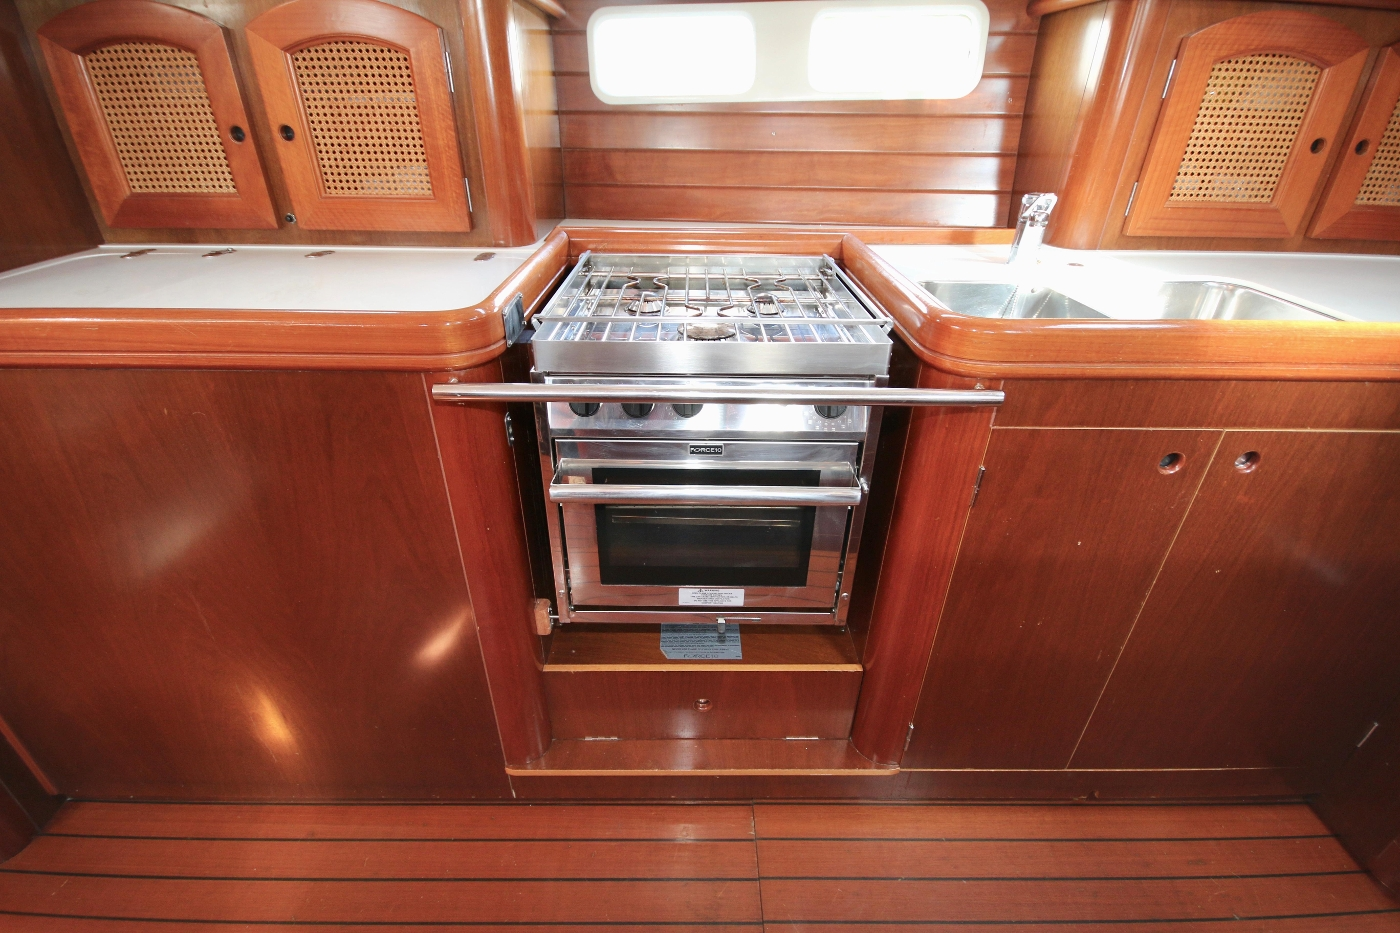 1997 Beneteau Oceanis 461, Force 10 stove & oven